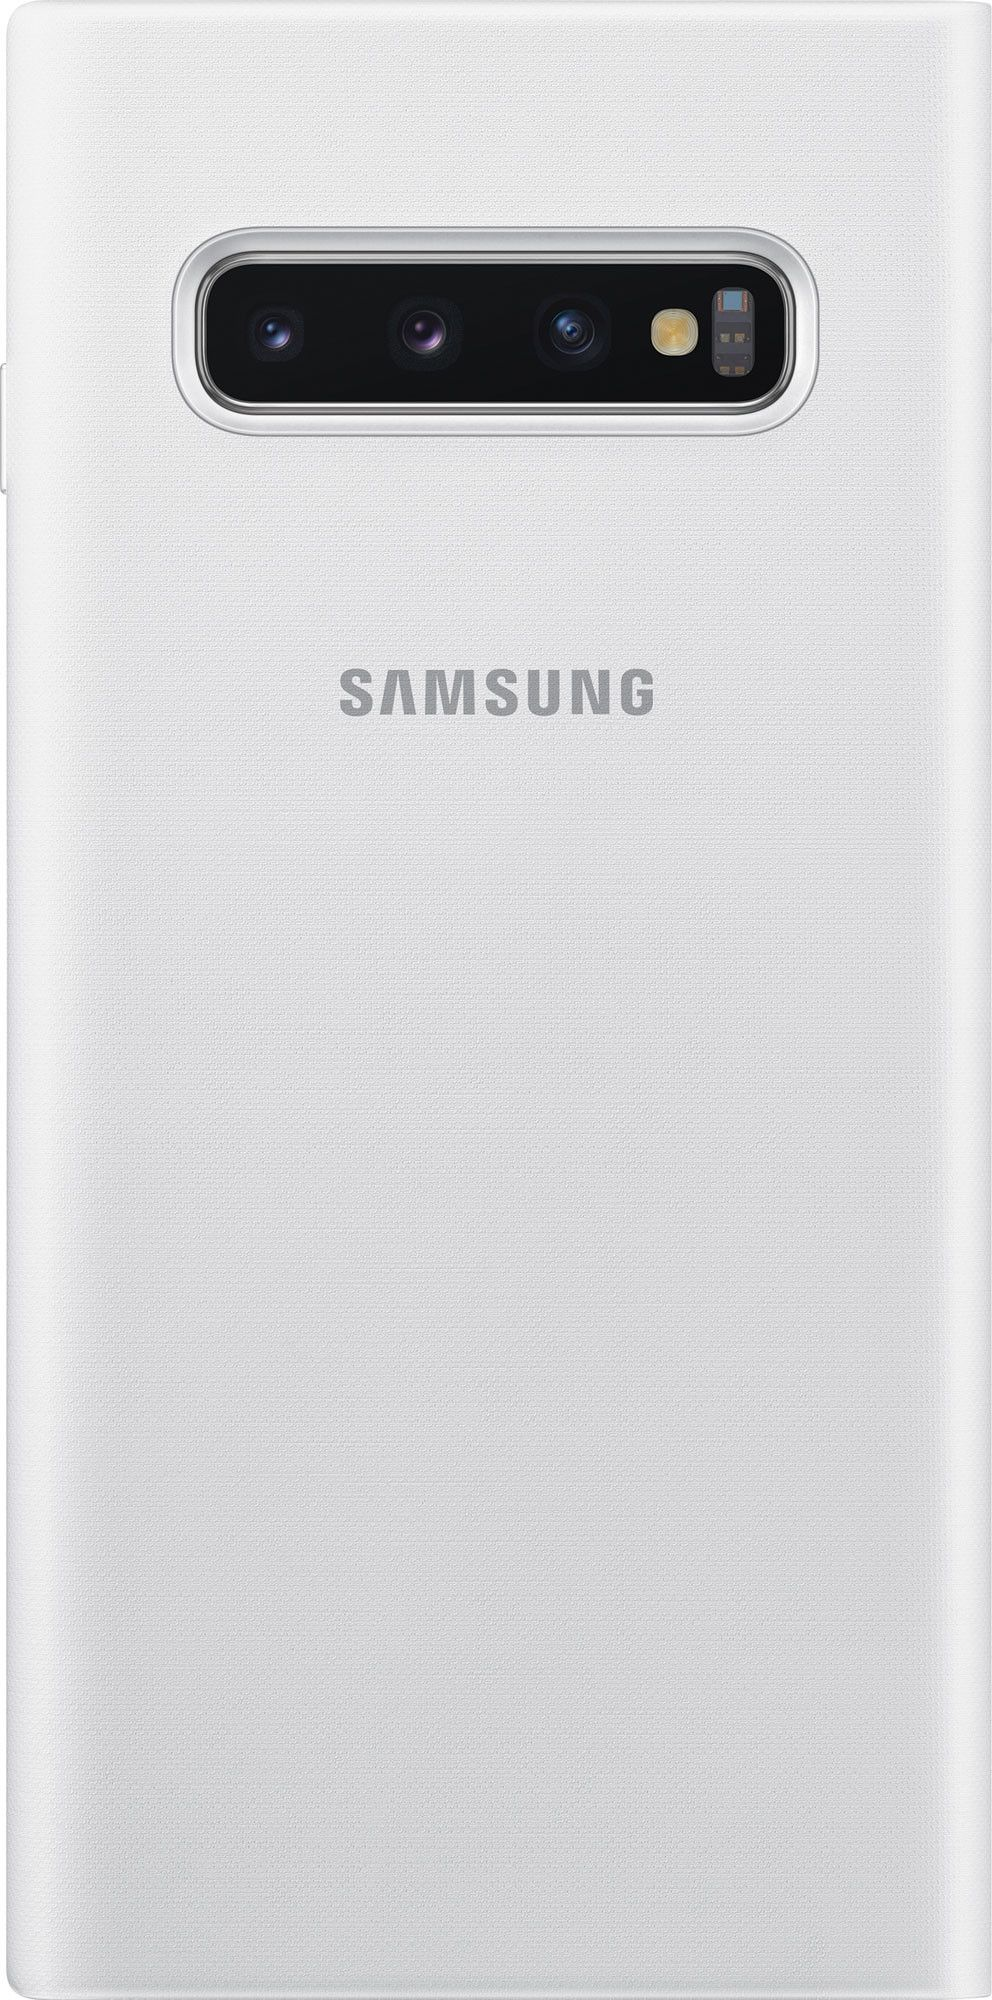 Чехол-книжка Samsung LED View Cover для Samsung Galaxy S10 (EF-NG973PWEGRU) White от Територія твоєї техніки - 2